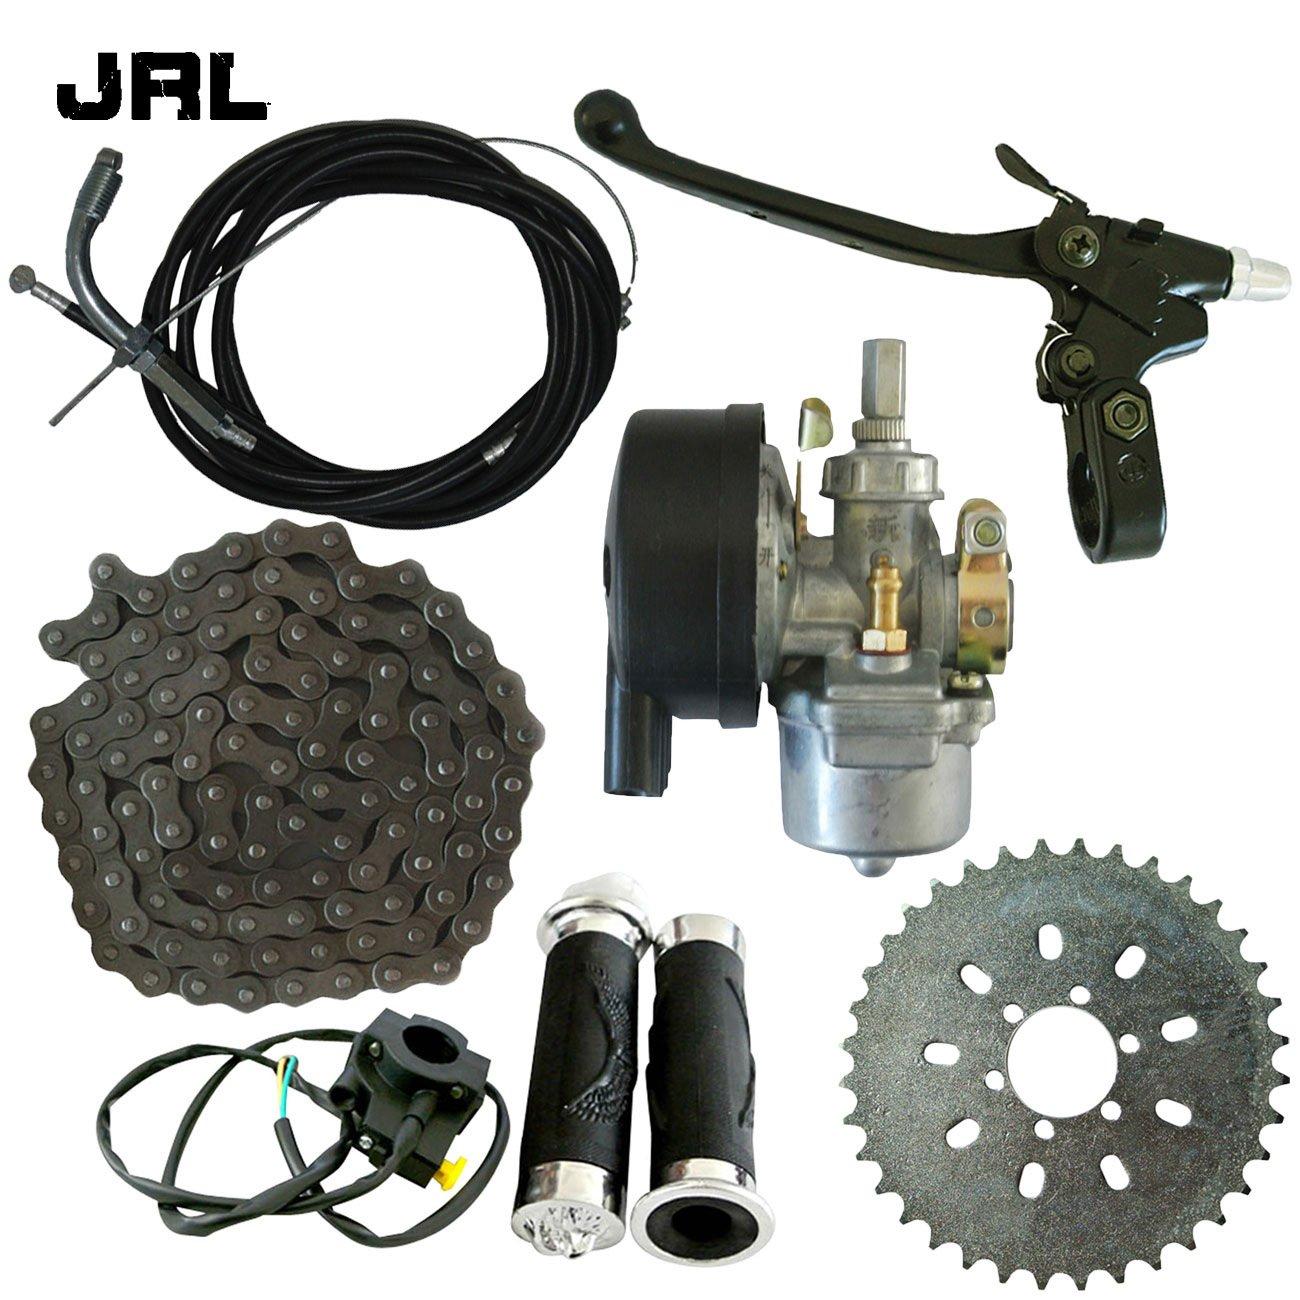 jrl 6 agujeros 36 dientes piñ ó n & 1 Set para manillar de bicicleta para 49/66/80cc motorizado bicicleta Huang Machinery